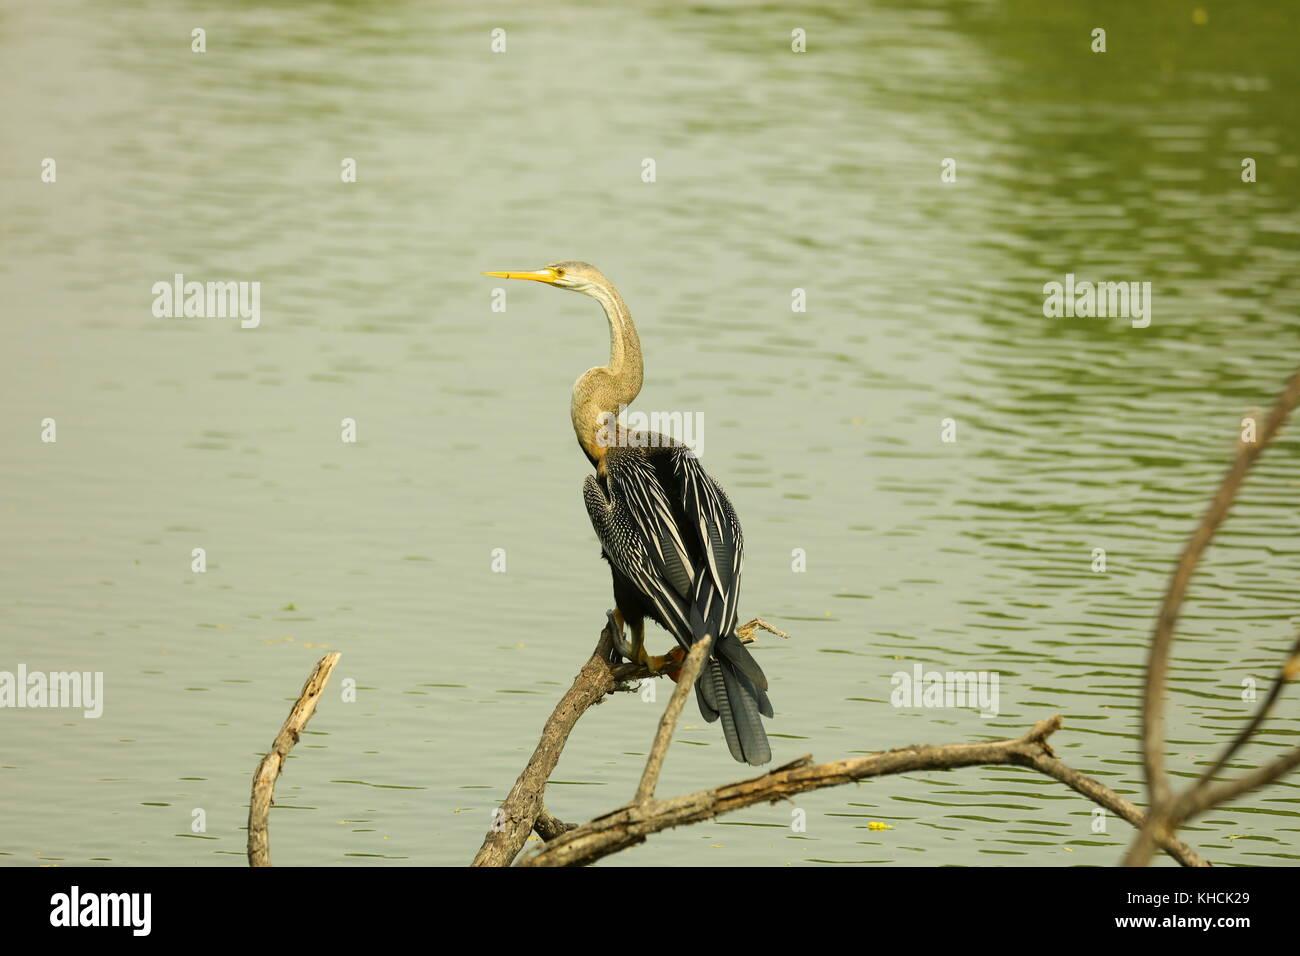 Snake Bird (Slender snake like neck and pointed dagger bill diagnostic) capture in Keoladeo National Park Rajasthan - Stock Image